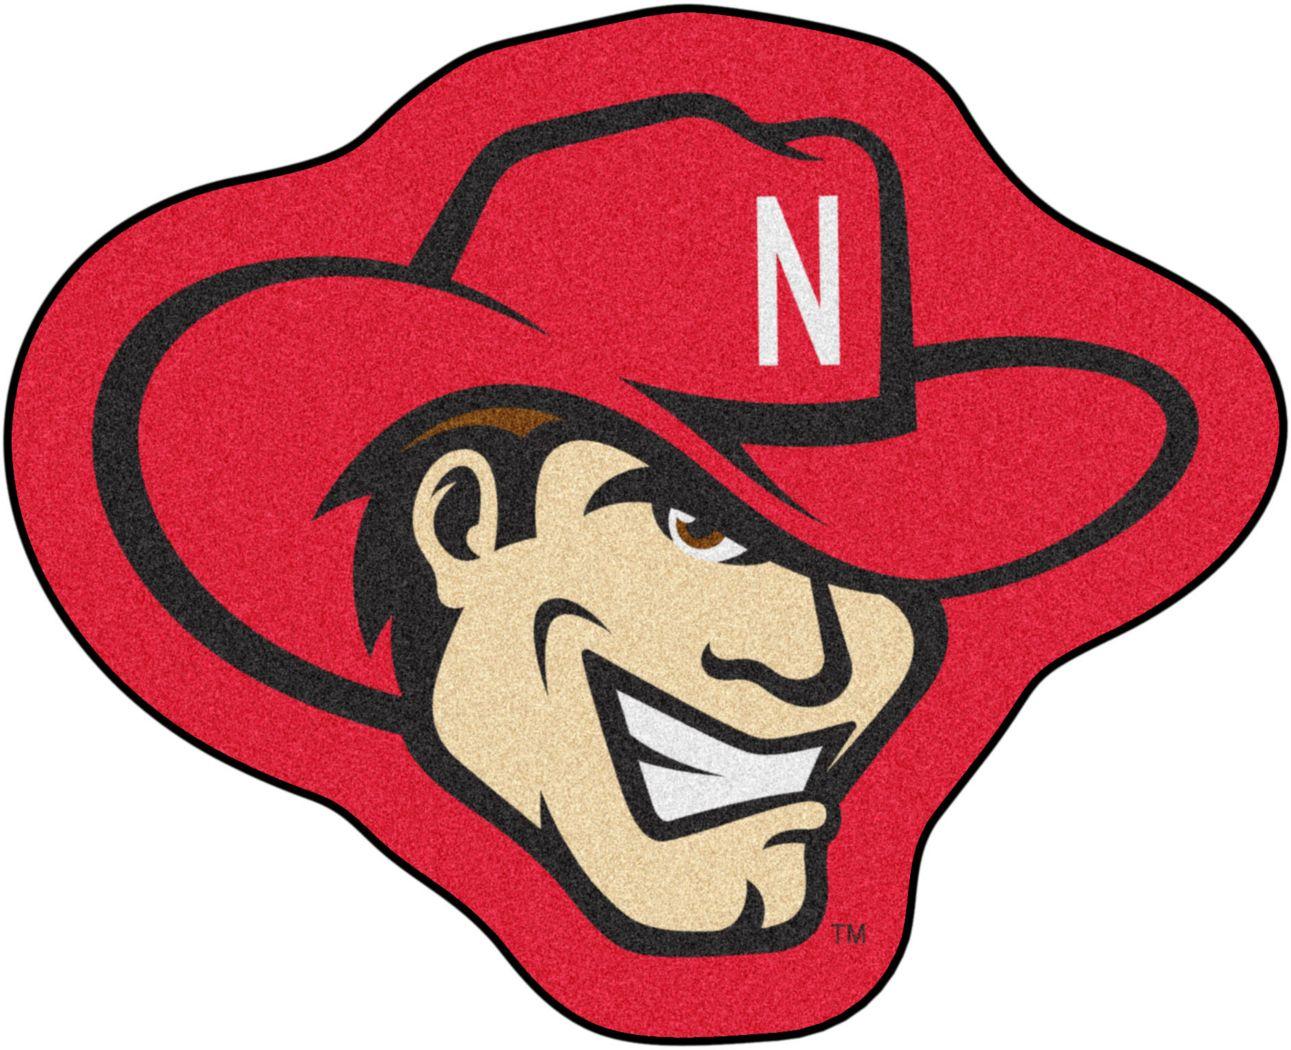 NCAA Football Mascot University of Nebraska